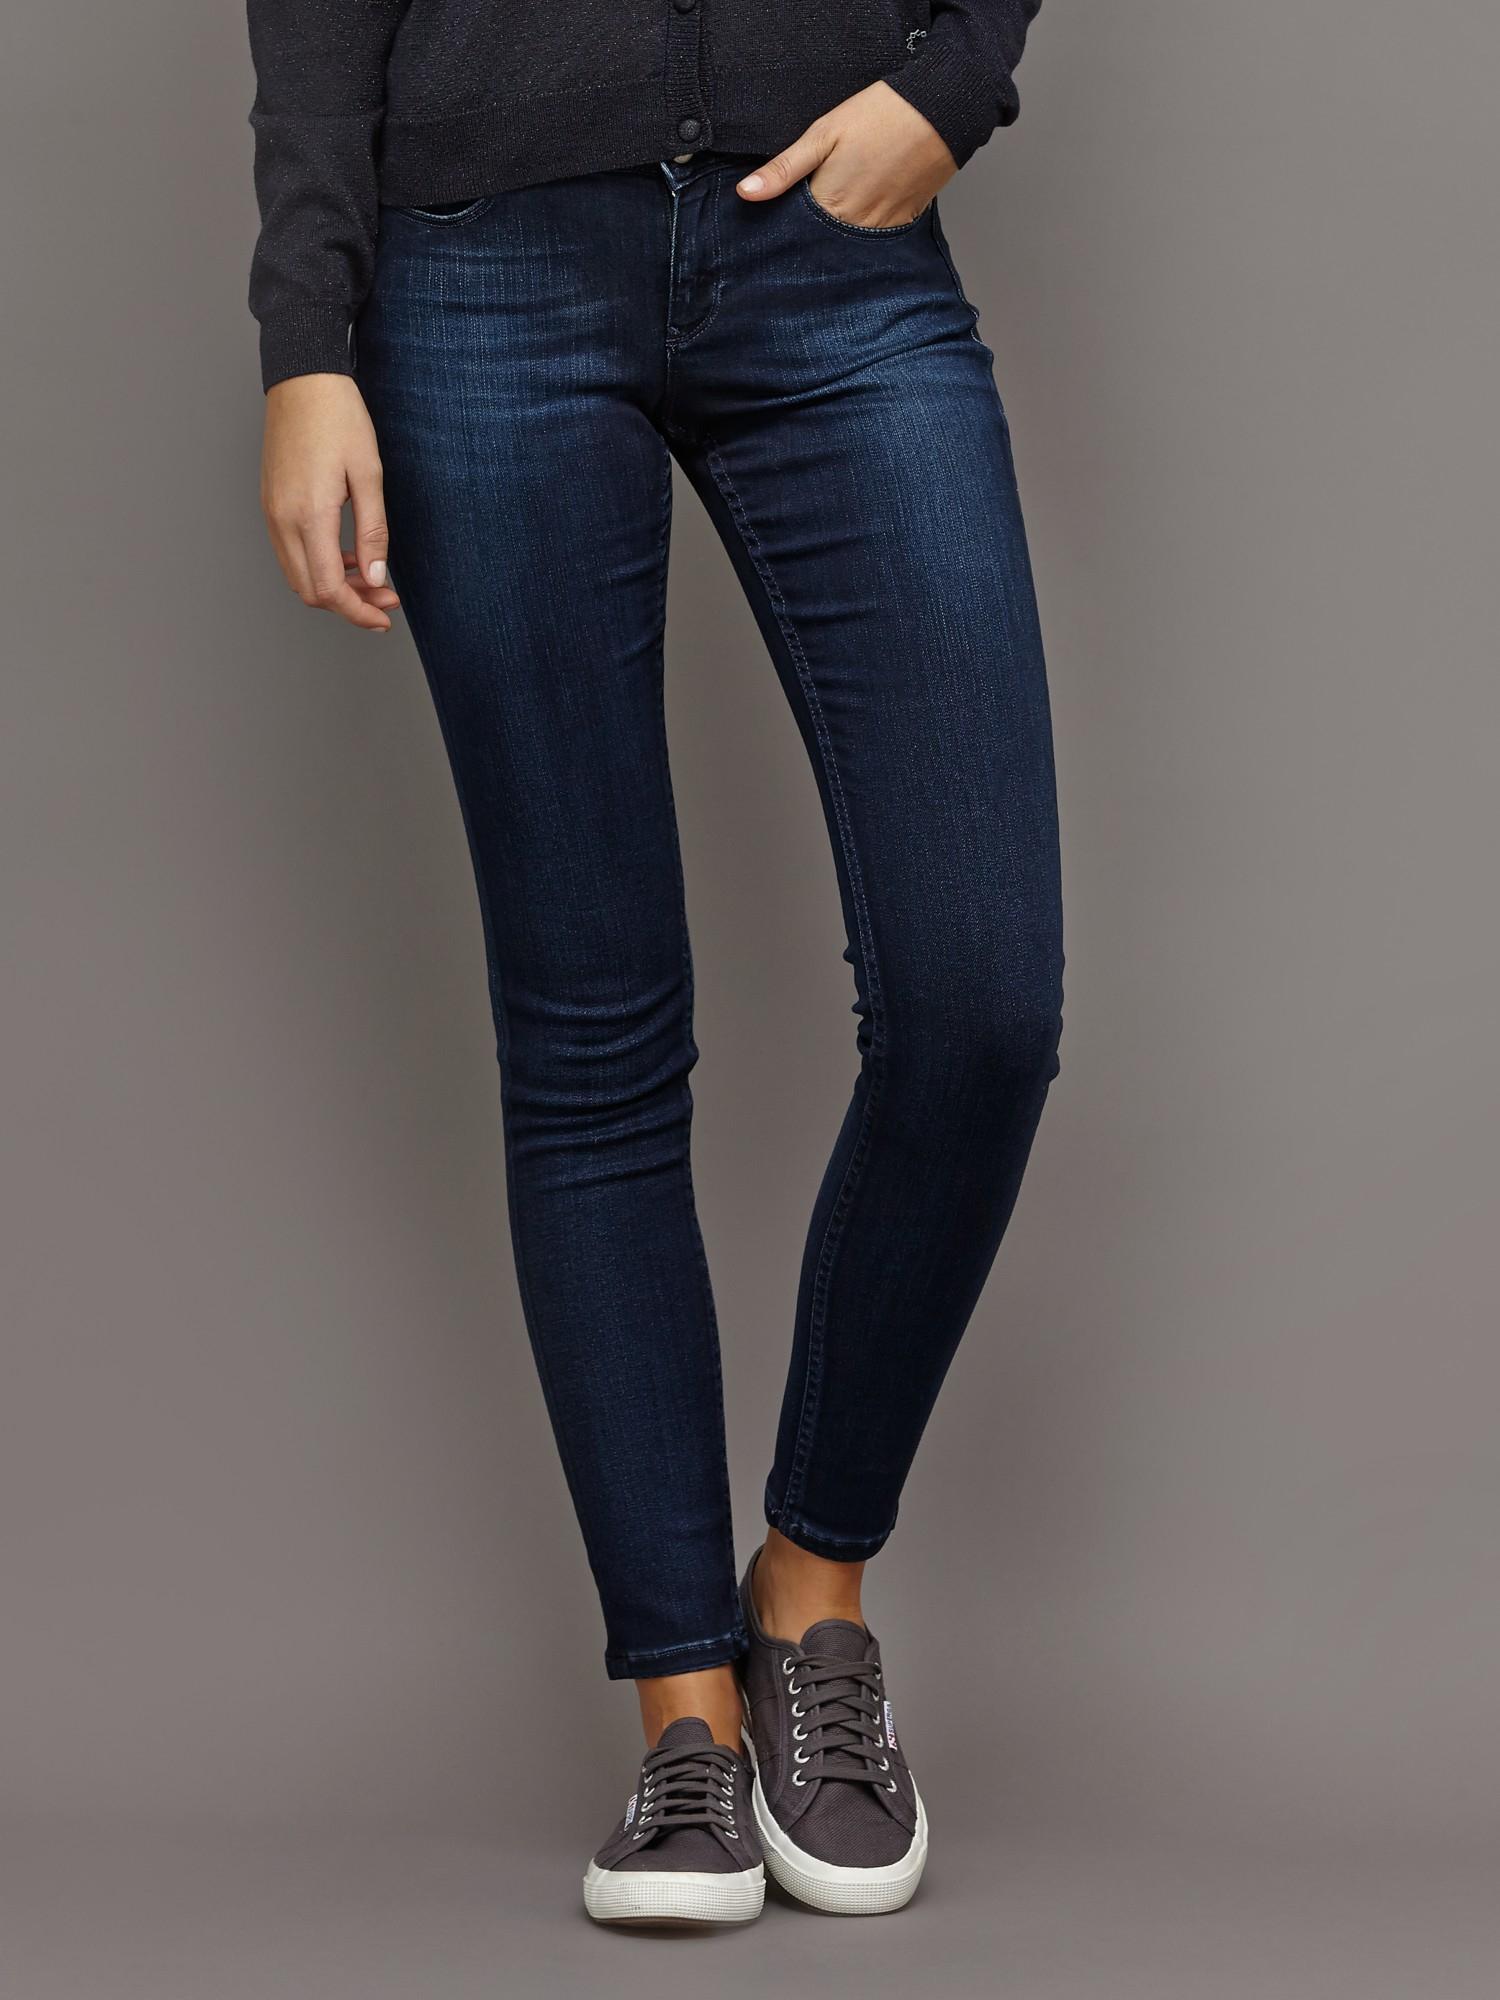 maison scotch la parisienne skinny jeans in blue lyst. Black Bedroom Furniture Sets. Home Design Ideas